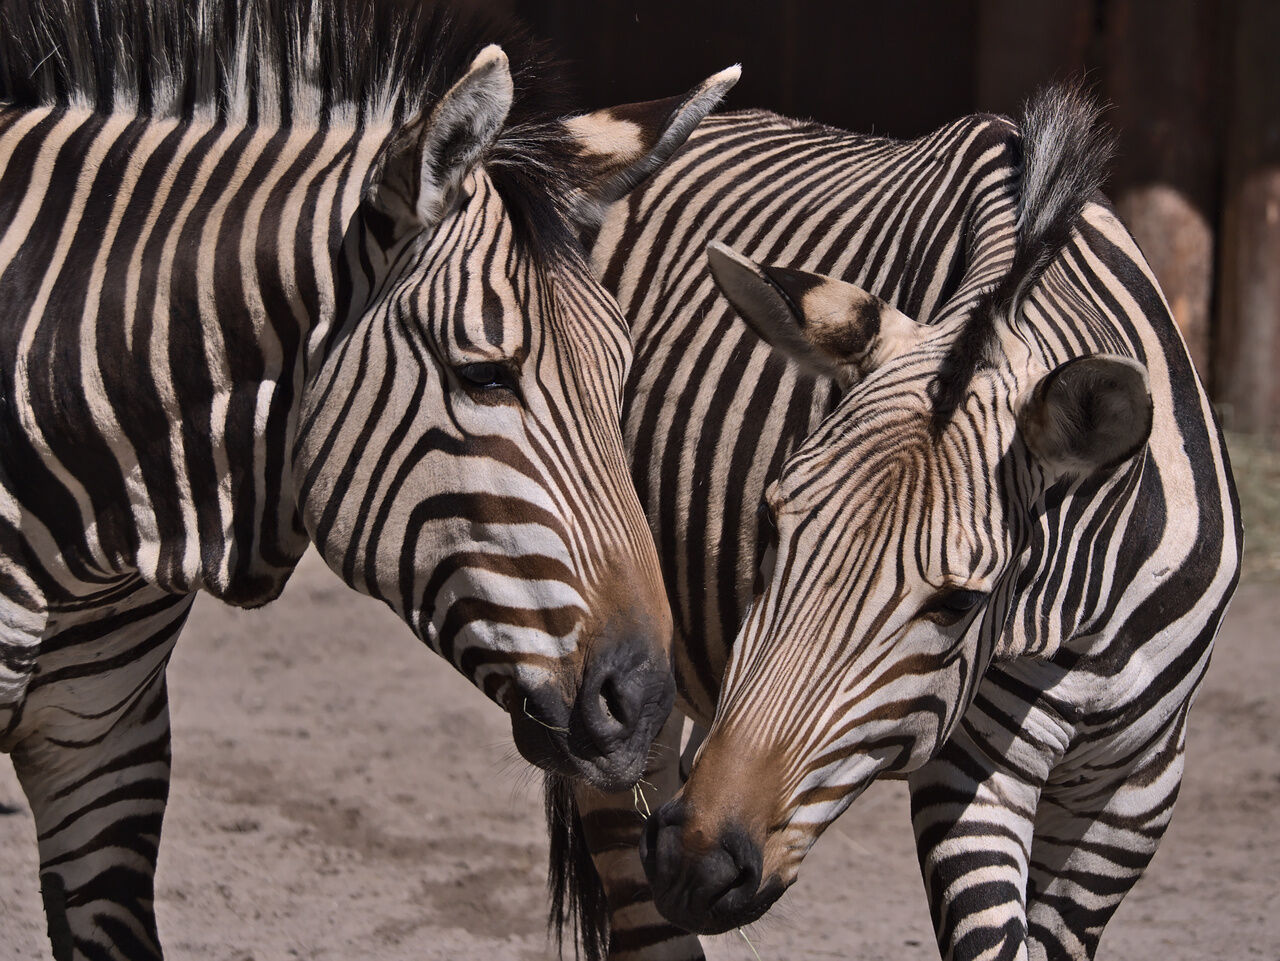 20200524_Zoo_Landau_016